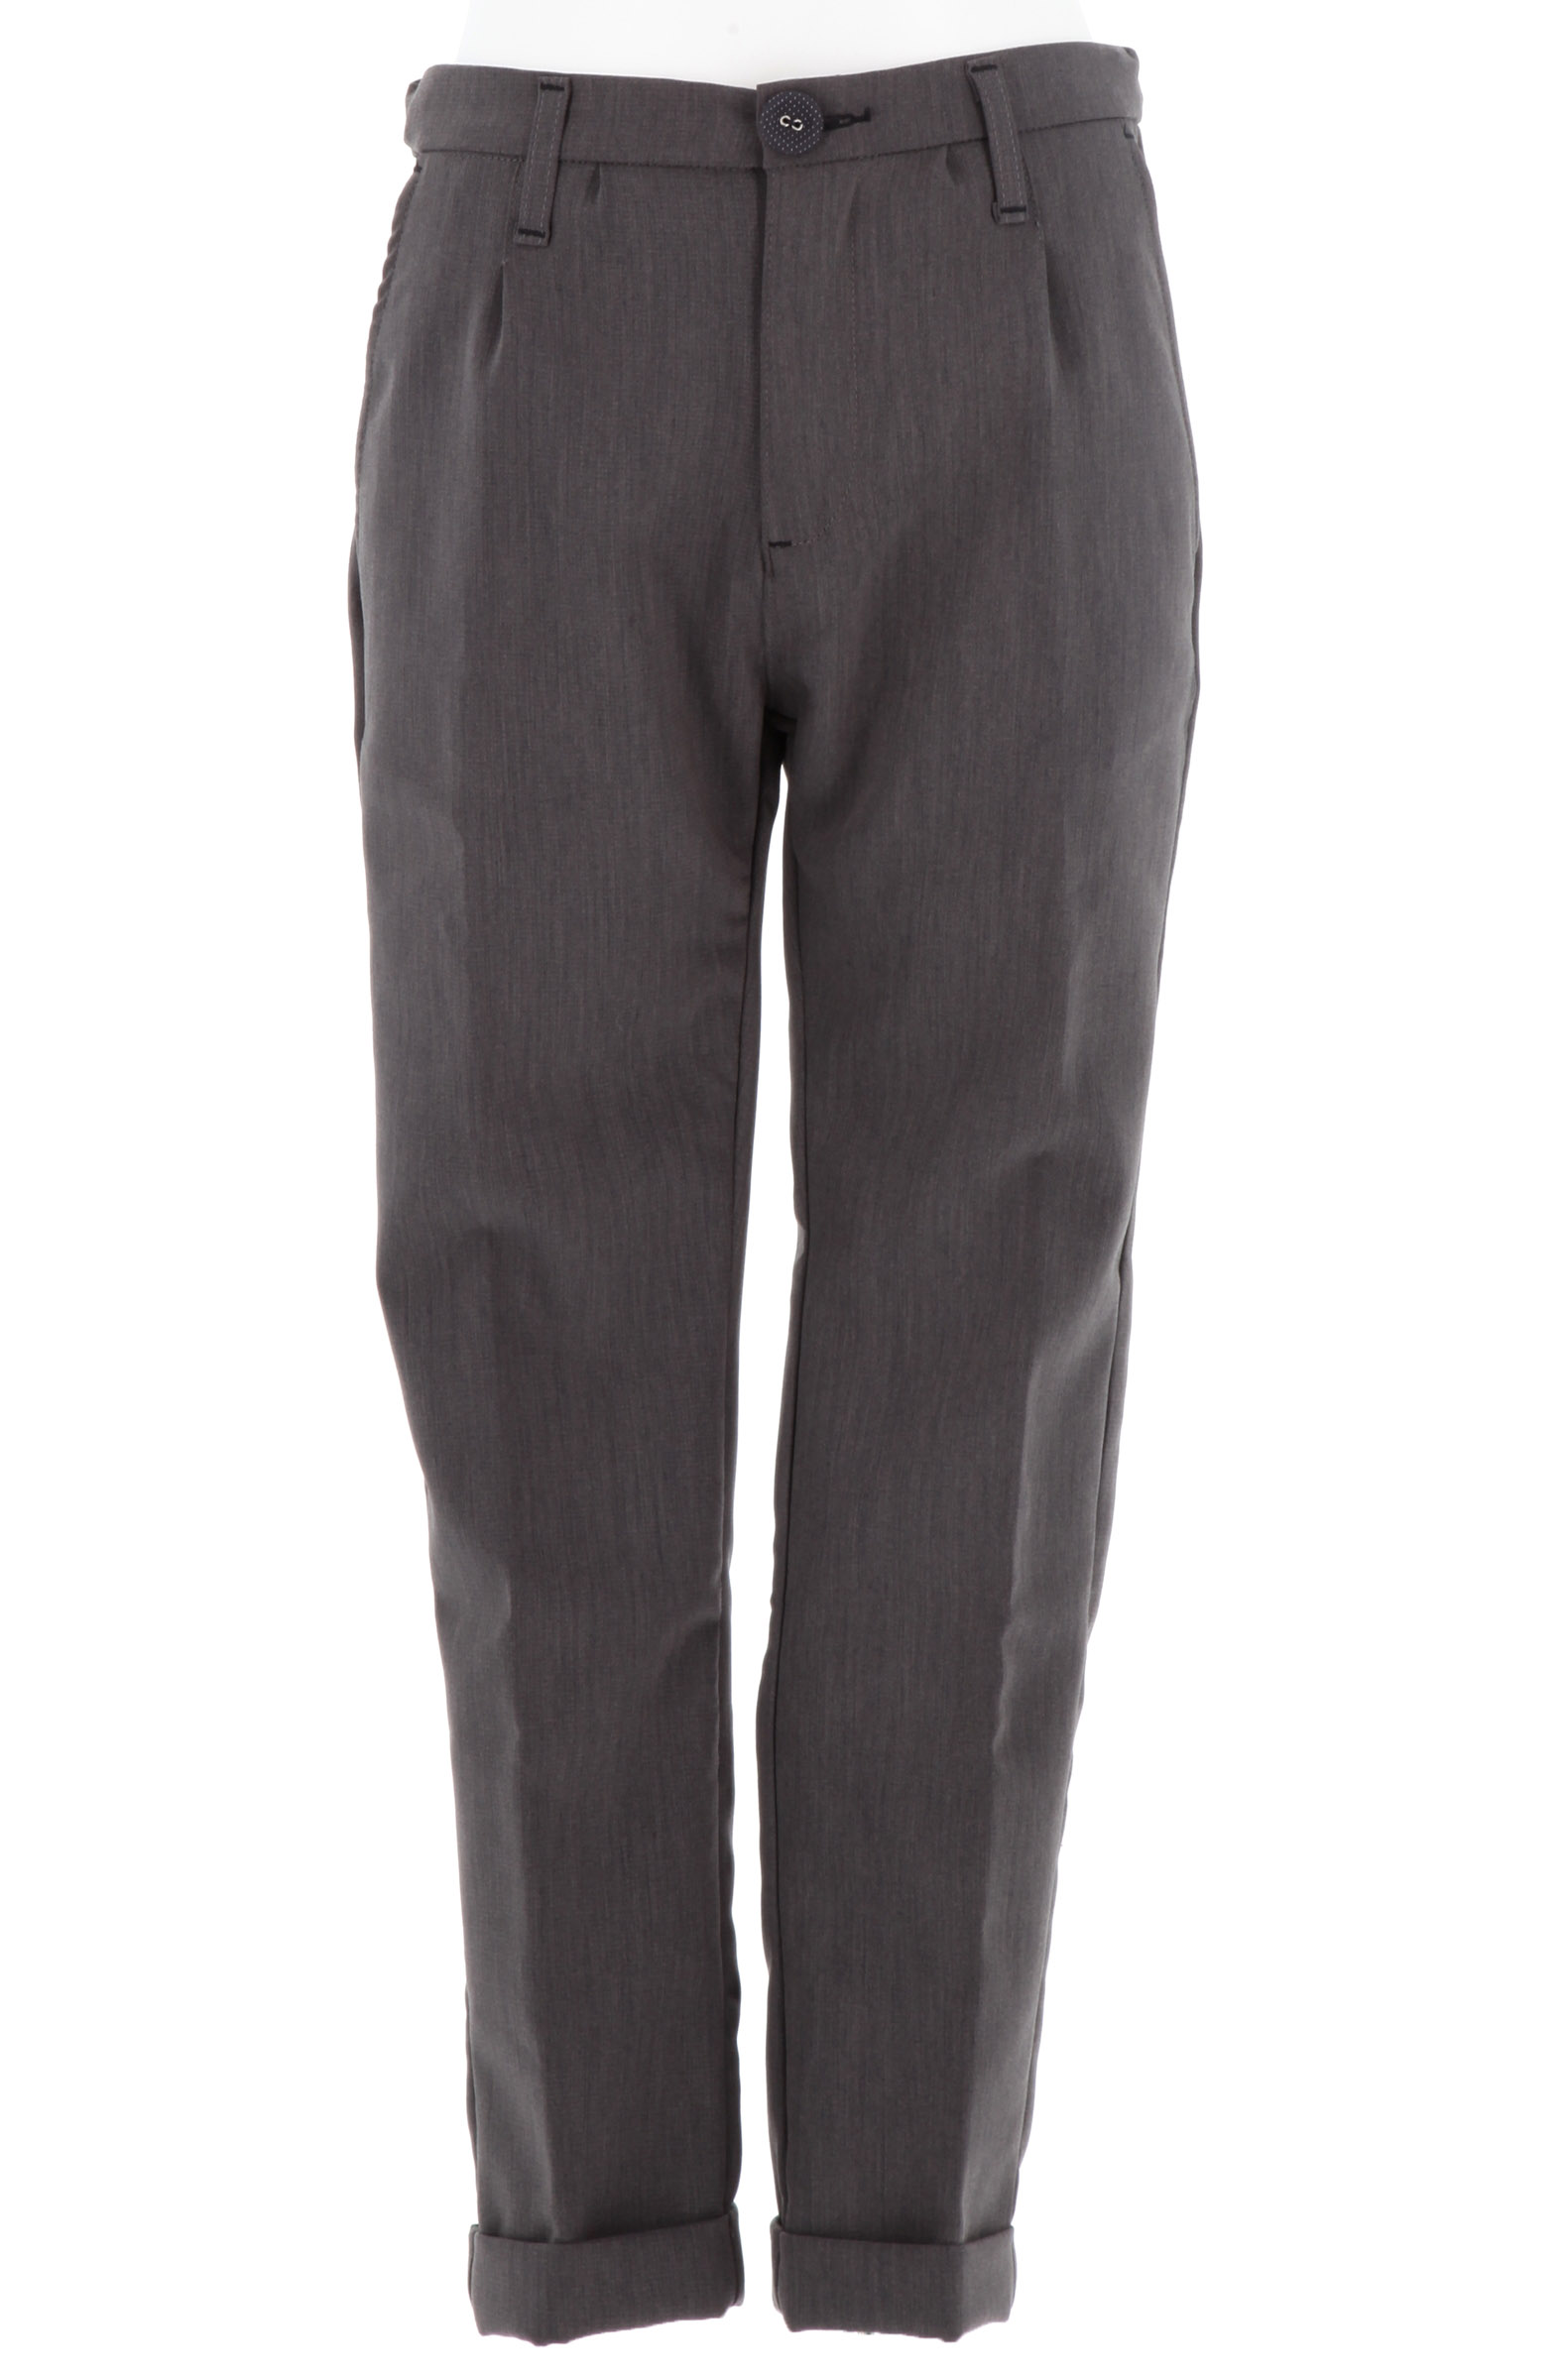 Pantaloni Neill Katter NEILL KATTER | Pantaloni | 11434GRIGIO